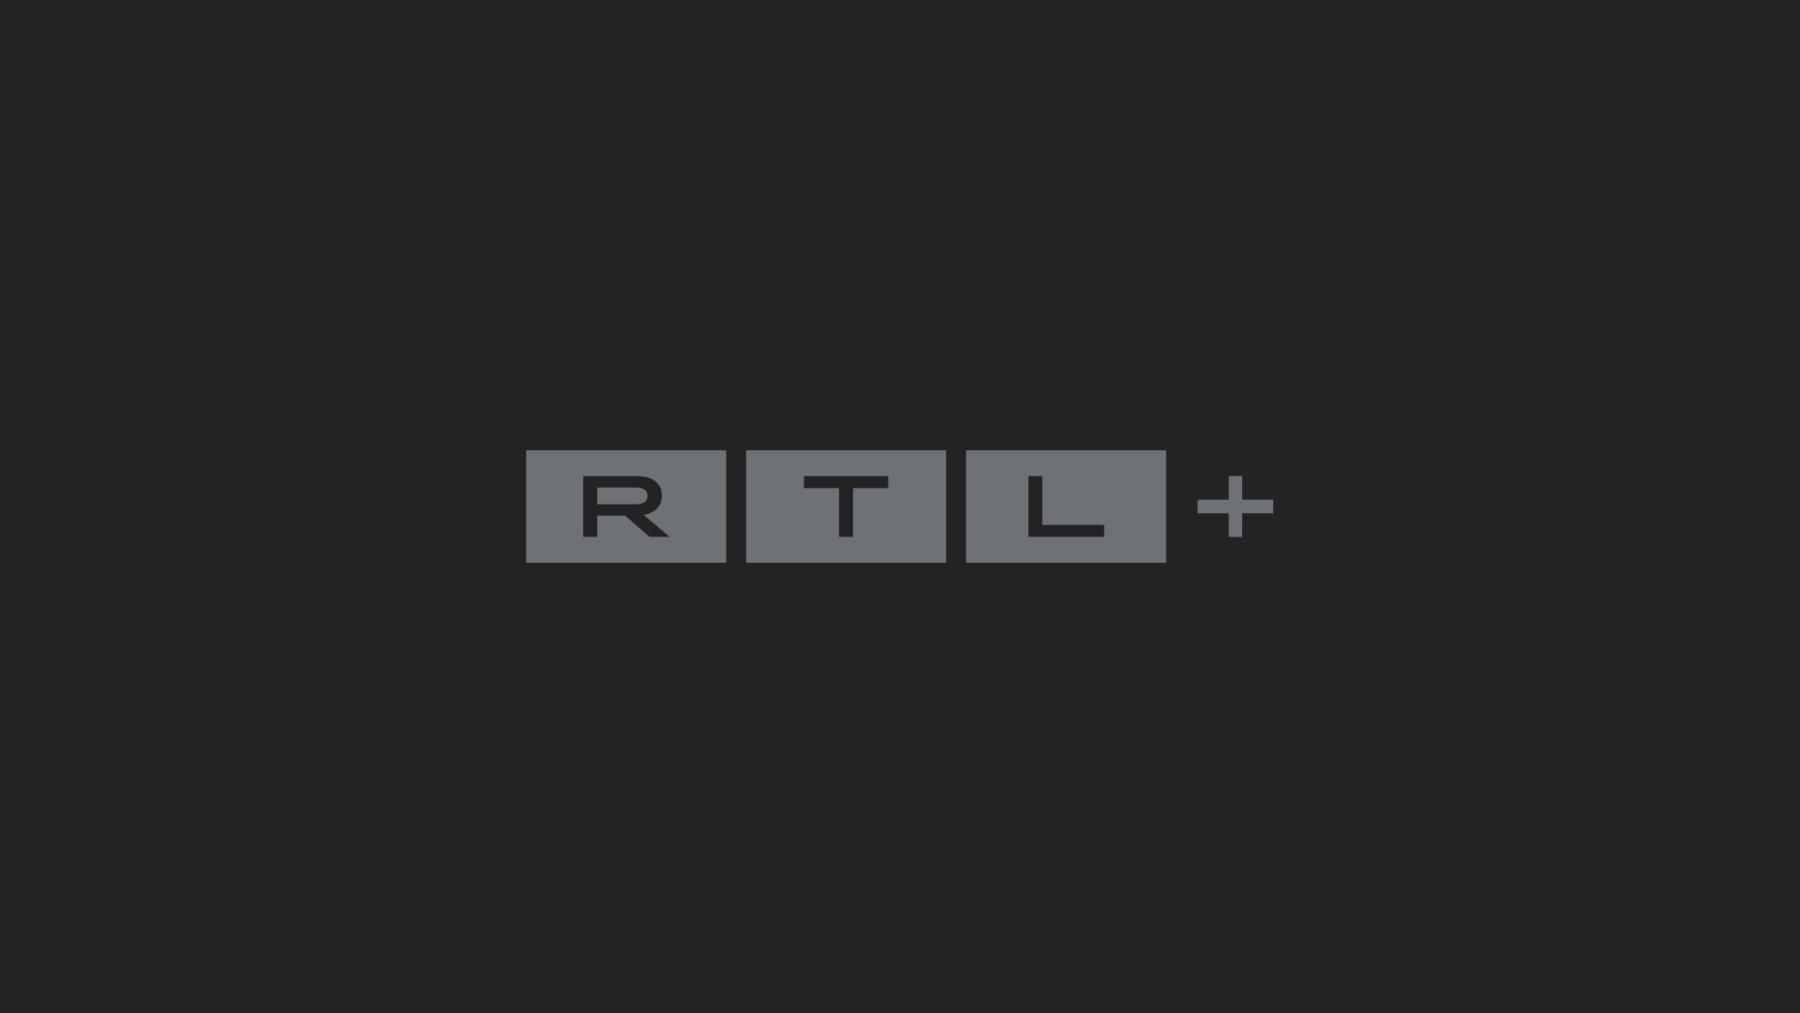 Themen: #triell_nachklapp, #kanzleramt_trotz_17%, #rotgrünrot, #impfbekloppte, #pimmelgate   Folge 14